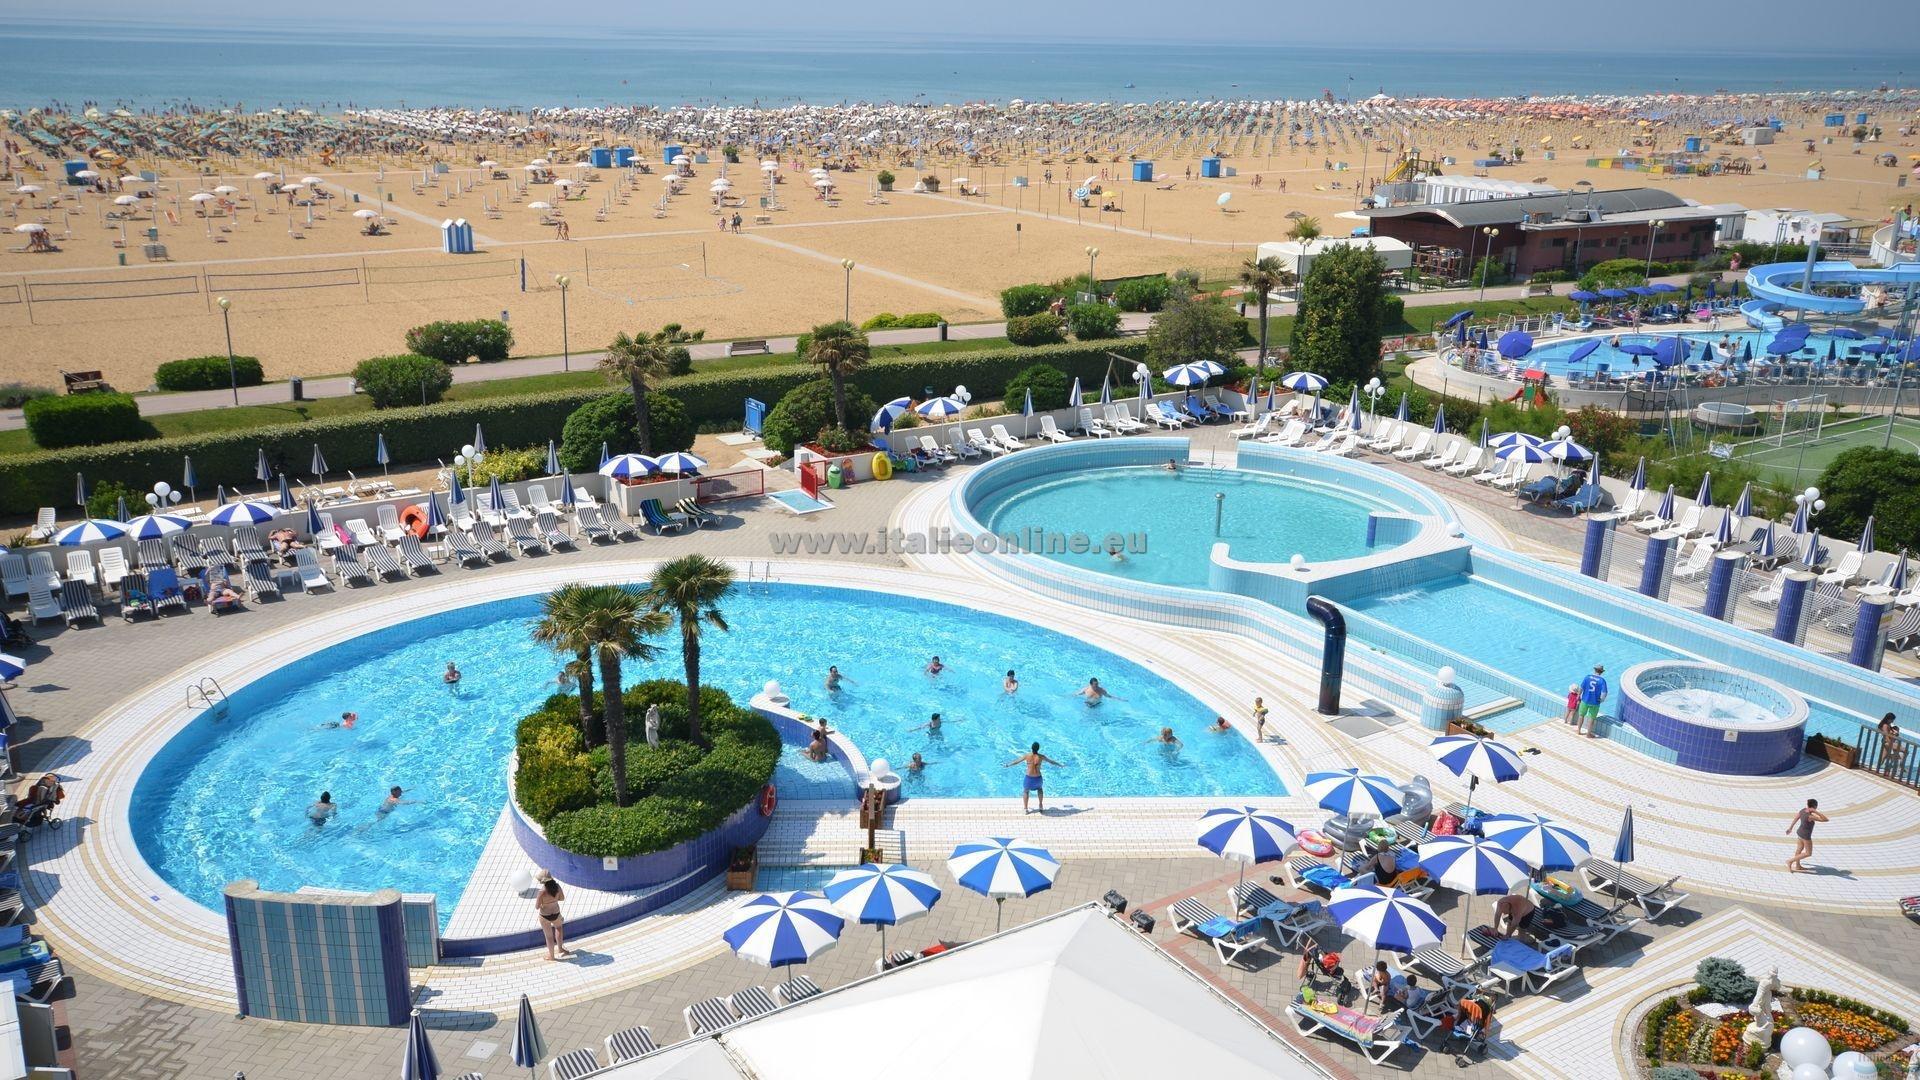 Aparthotel imperial bibione spiaggia italia italieonline for Piscina olimpia prezzi